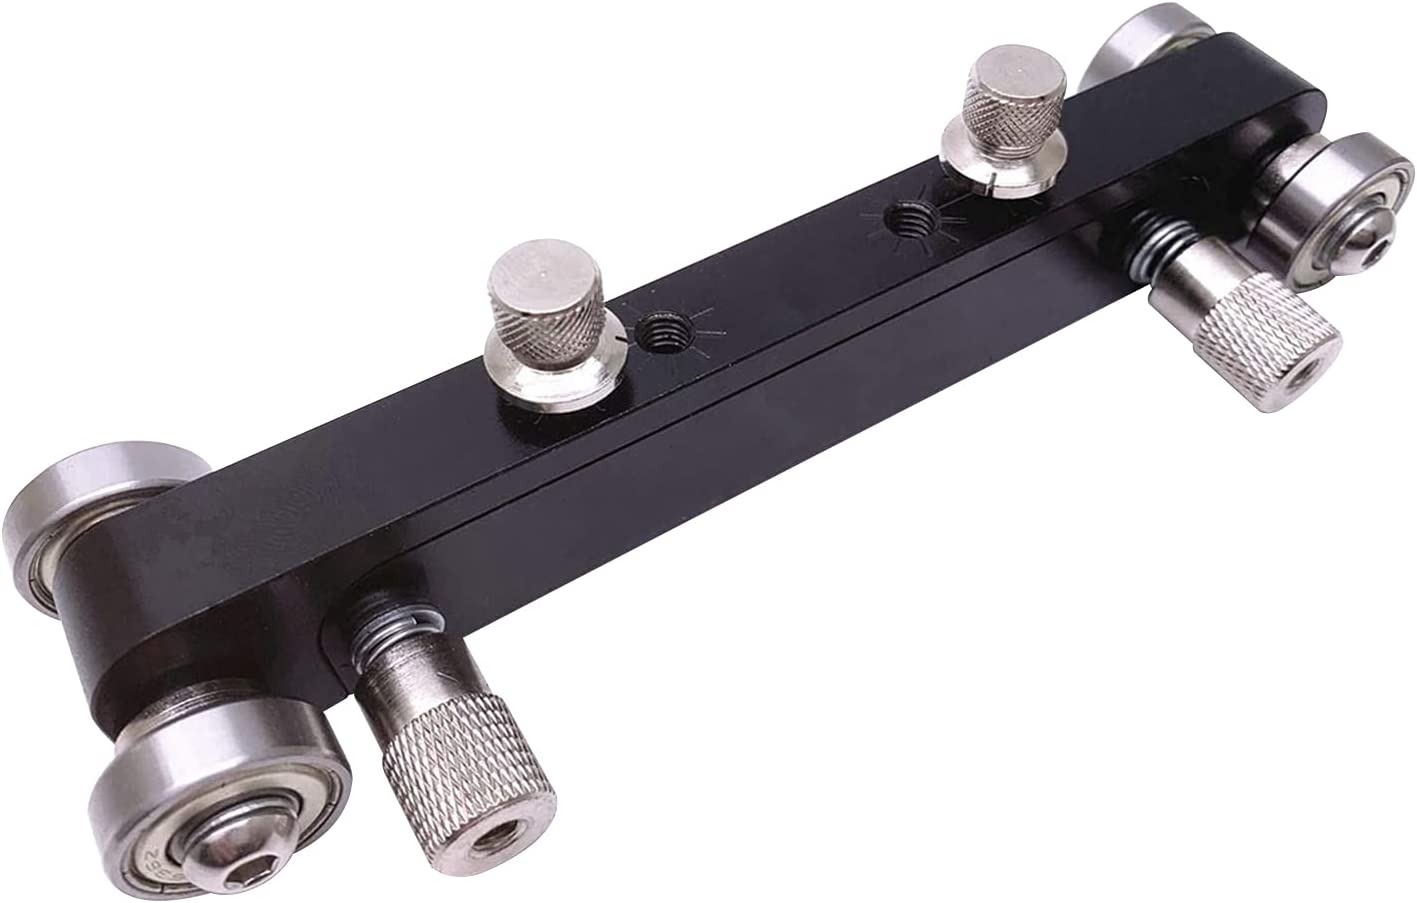 SYCOOVEN Small ☆新作入荷☆新品 Guitar 超目玉 Nut Sander Saddle Bridge Practical Precisi